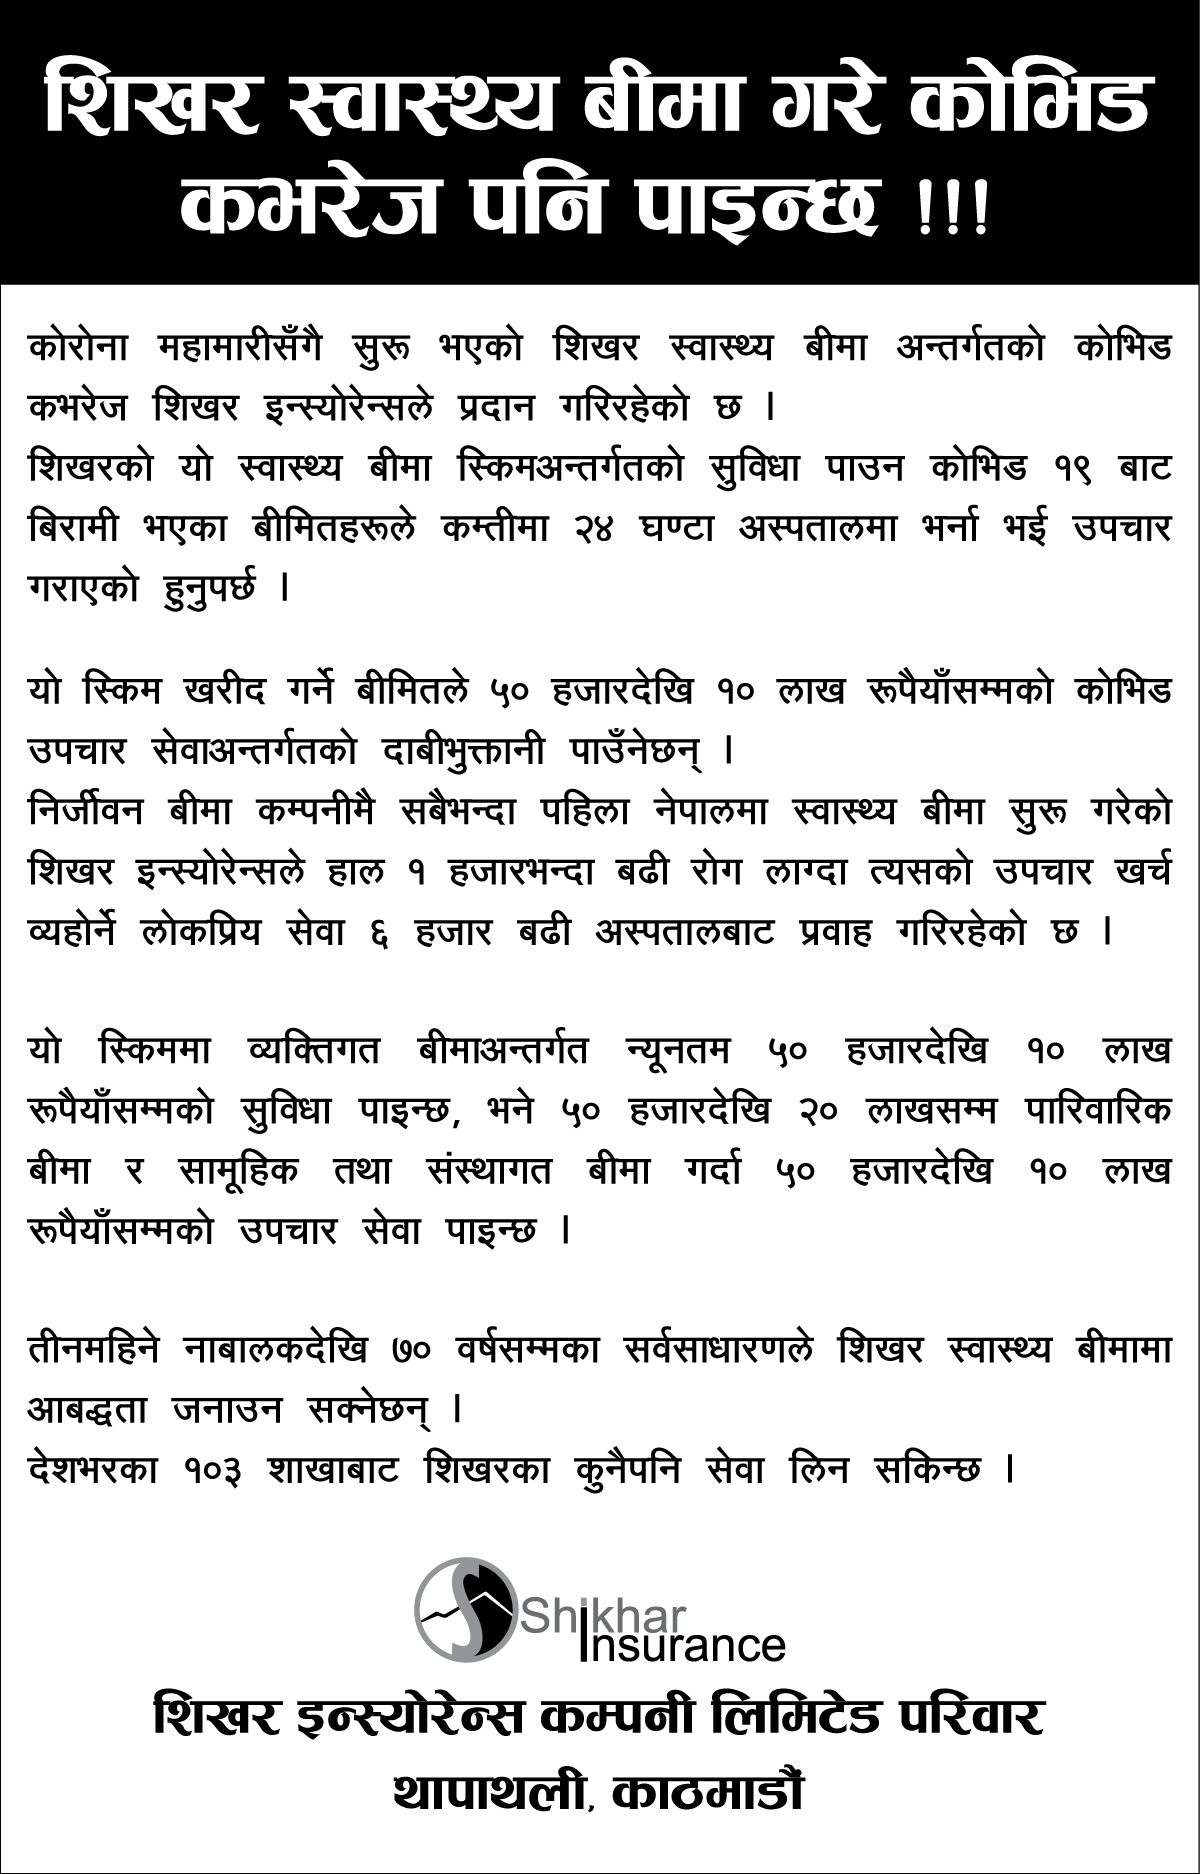 shikhar-health-insurance-covers-covid-insurance-too